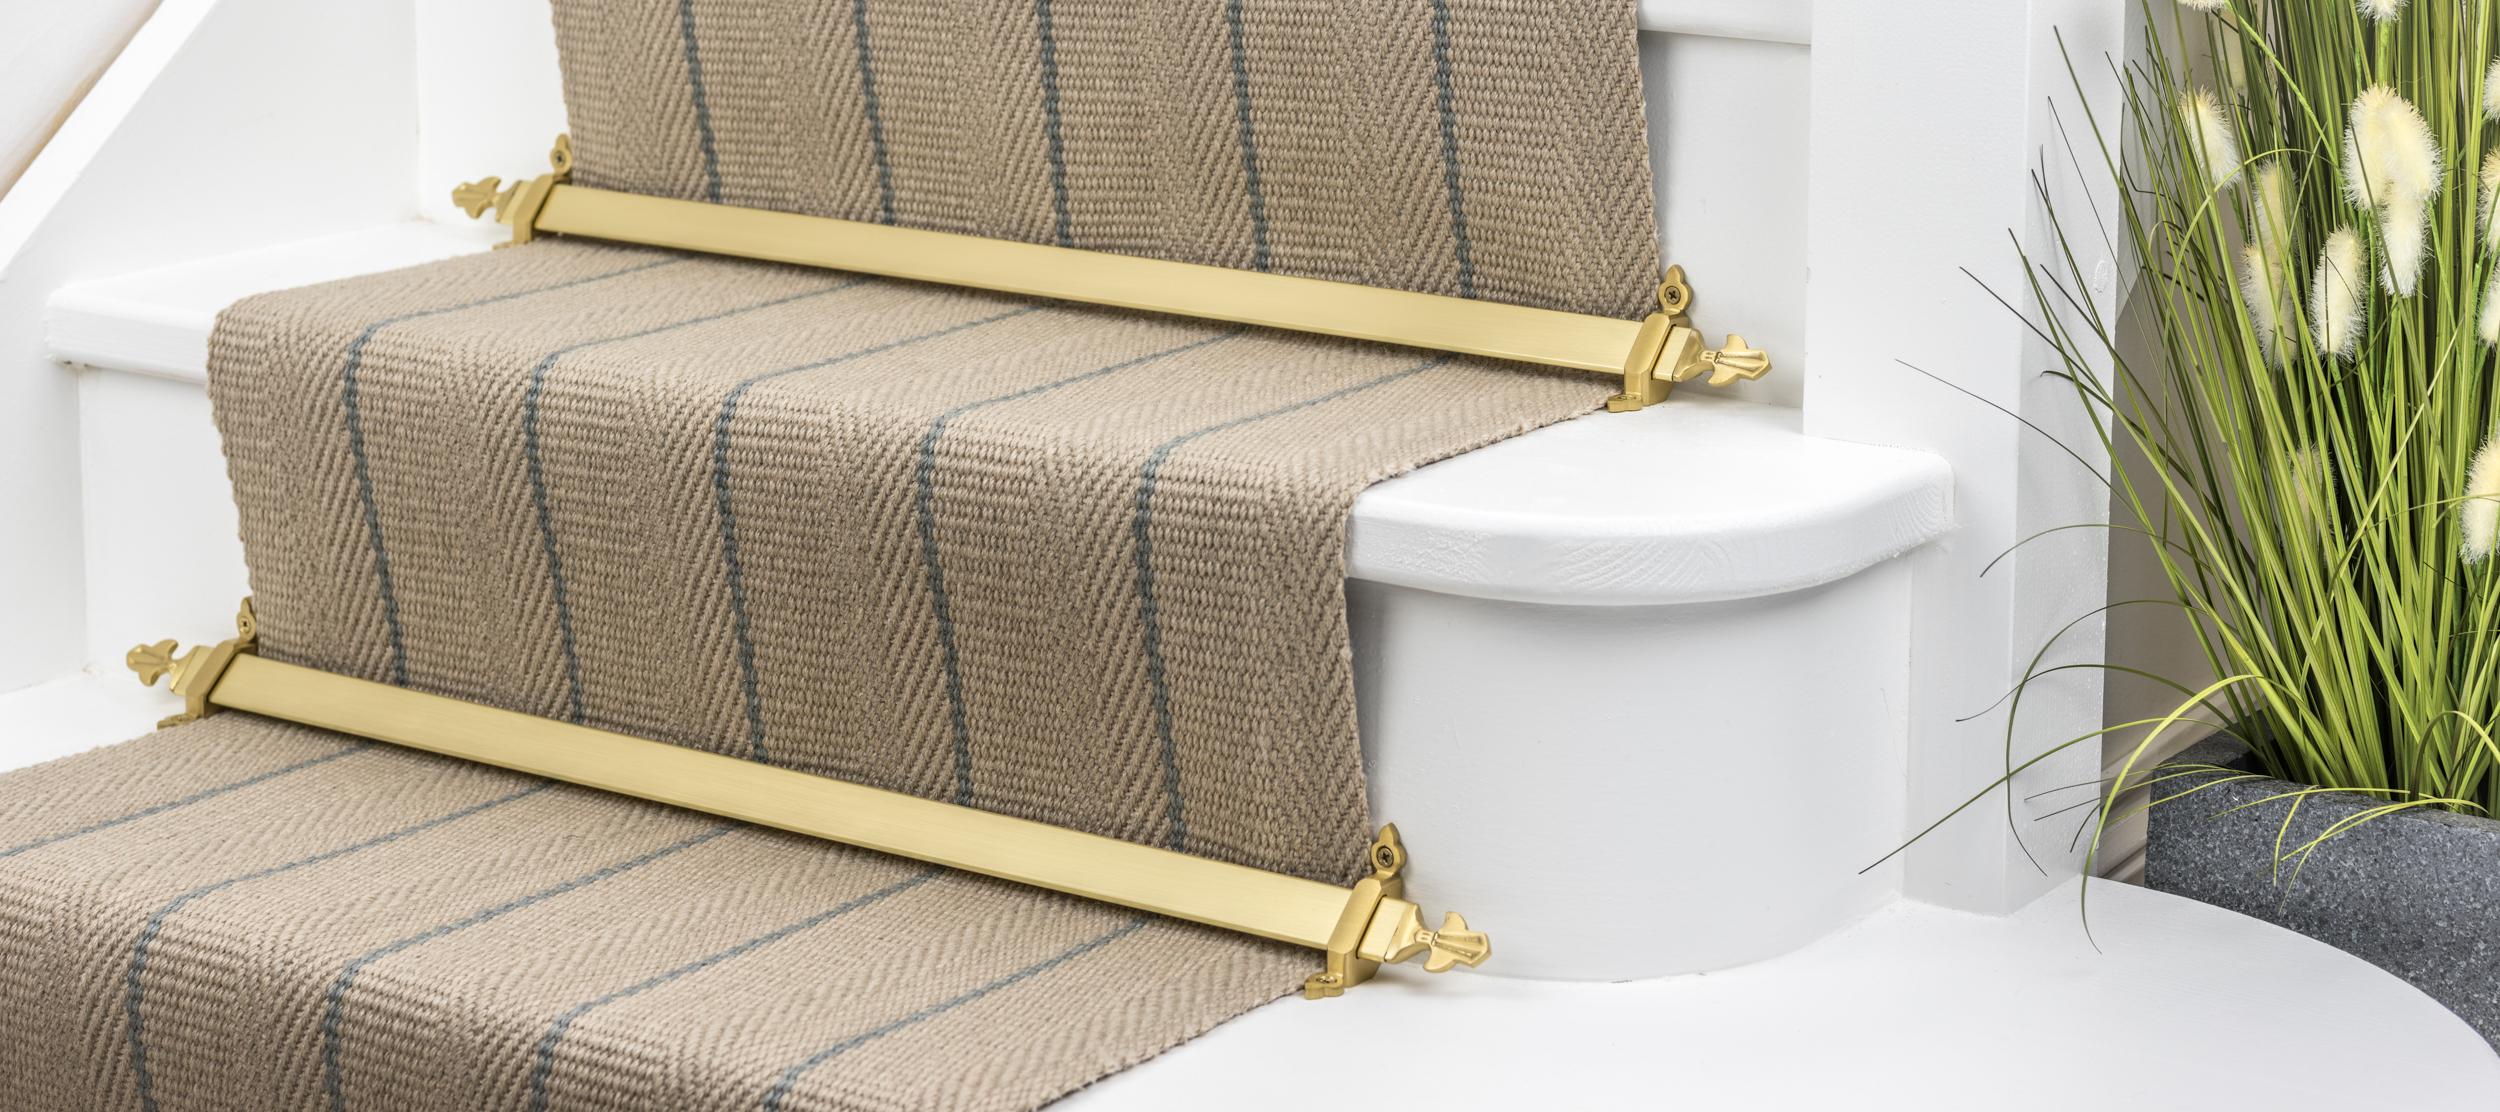 stairrods-satin-brasss-royale-louis.jpg